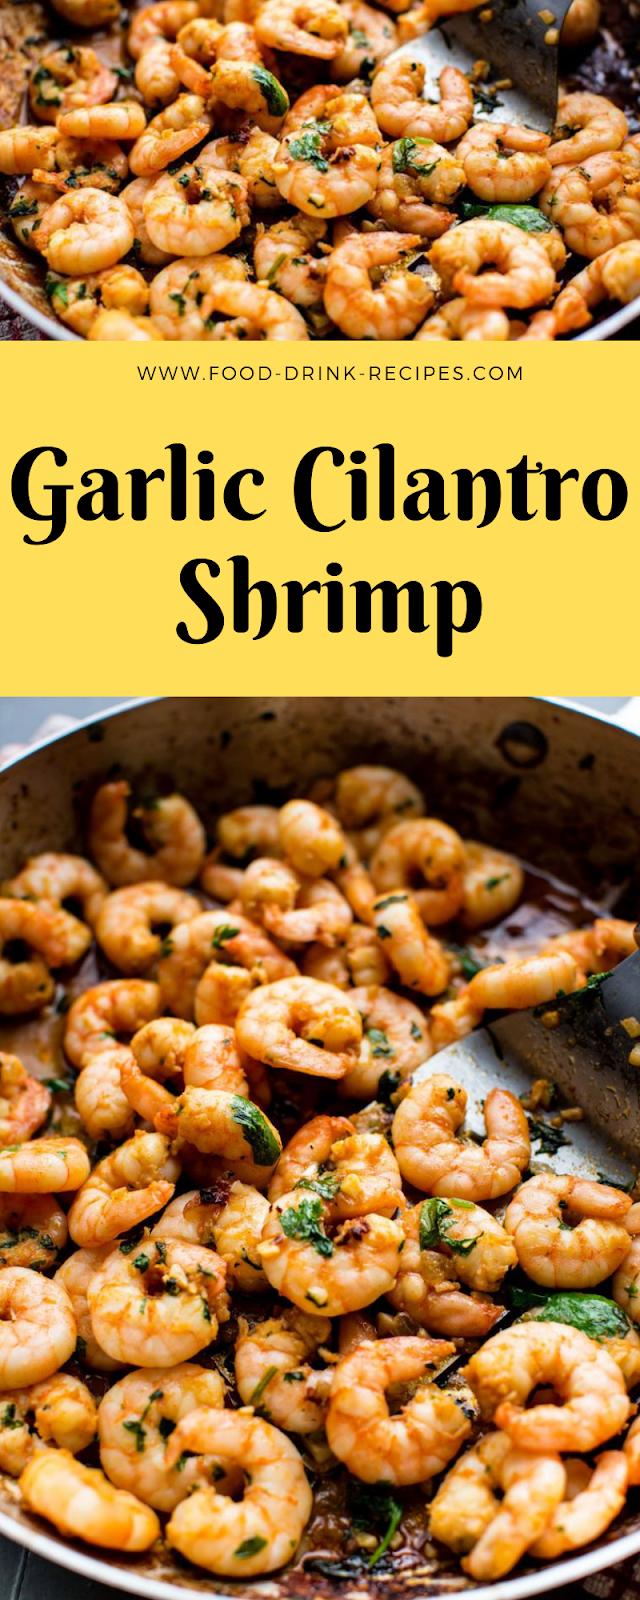 Garlic Cilantro Shrimp